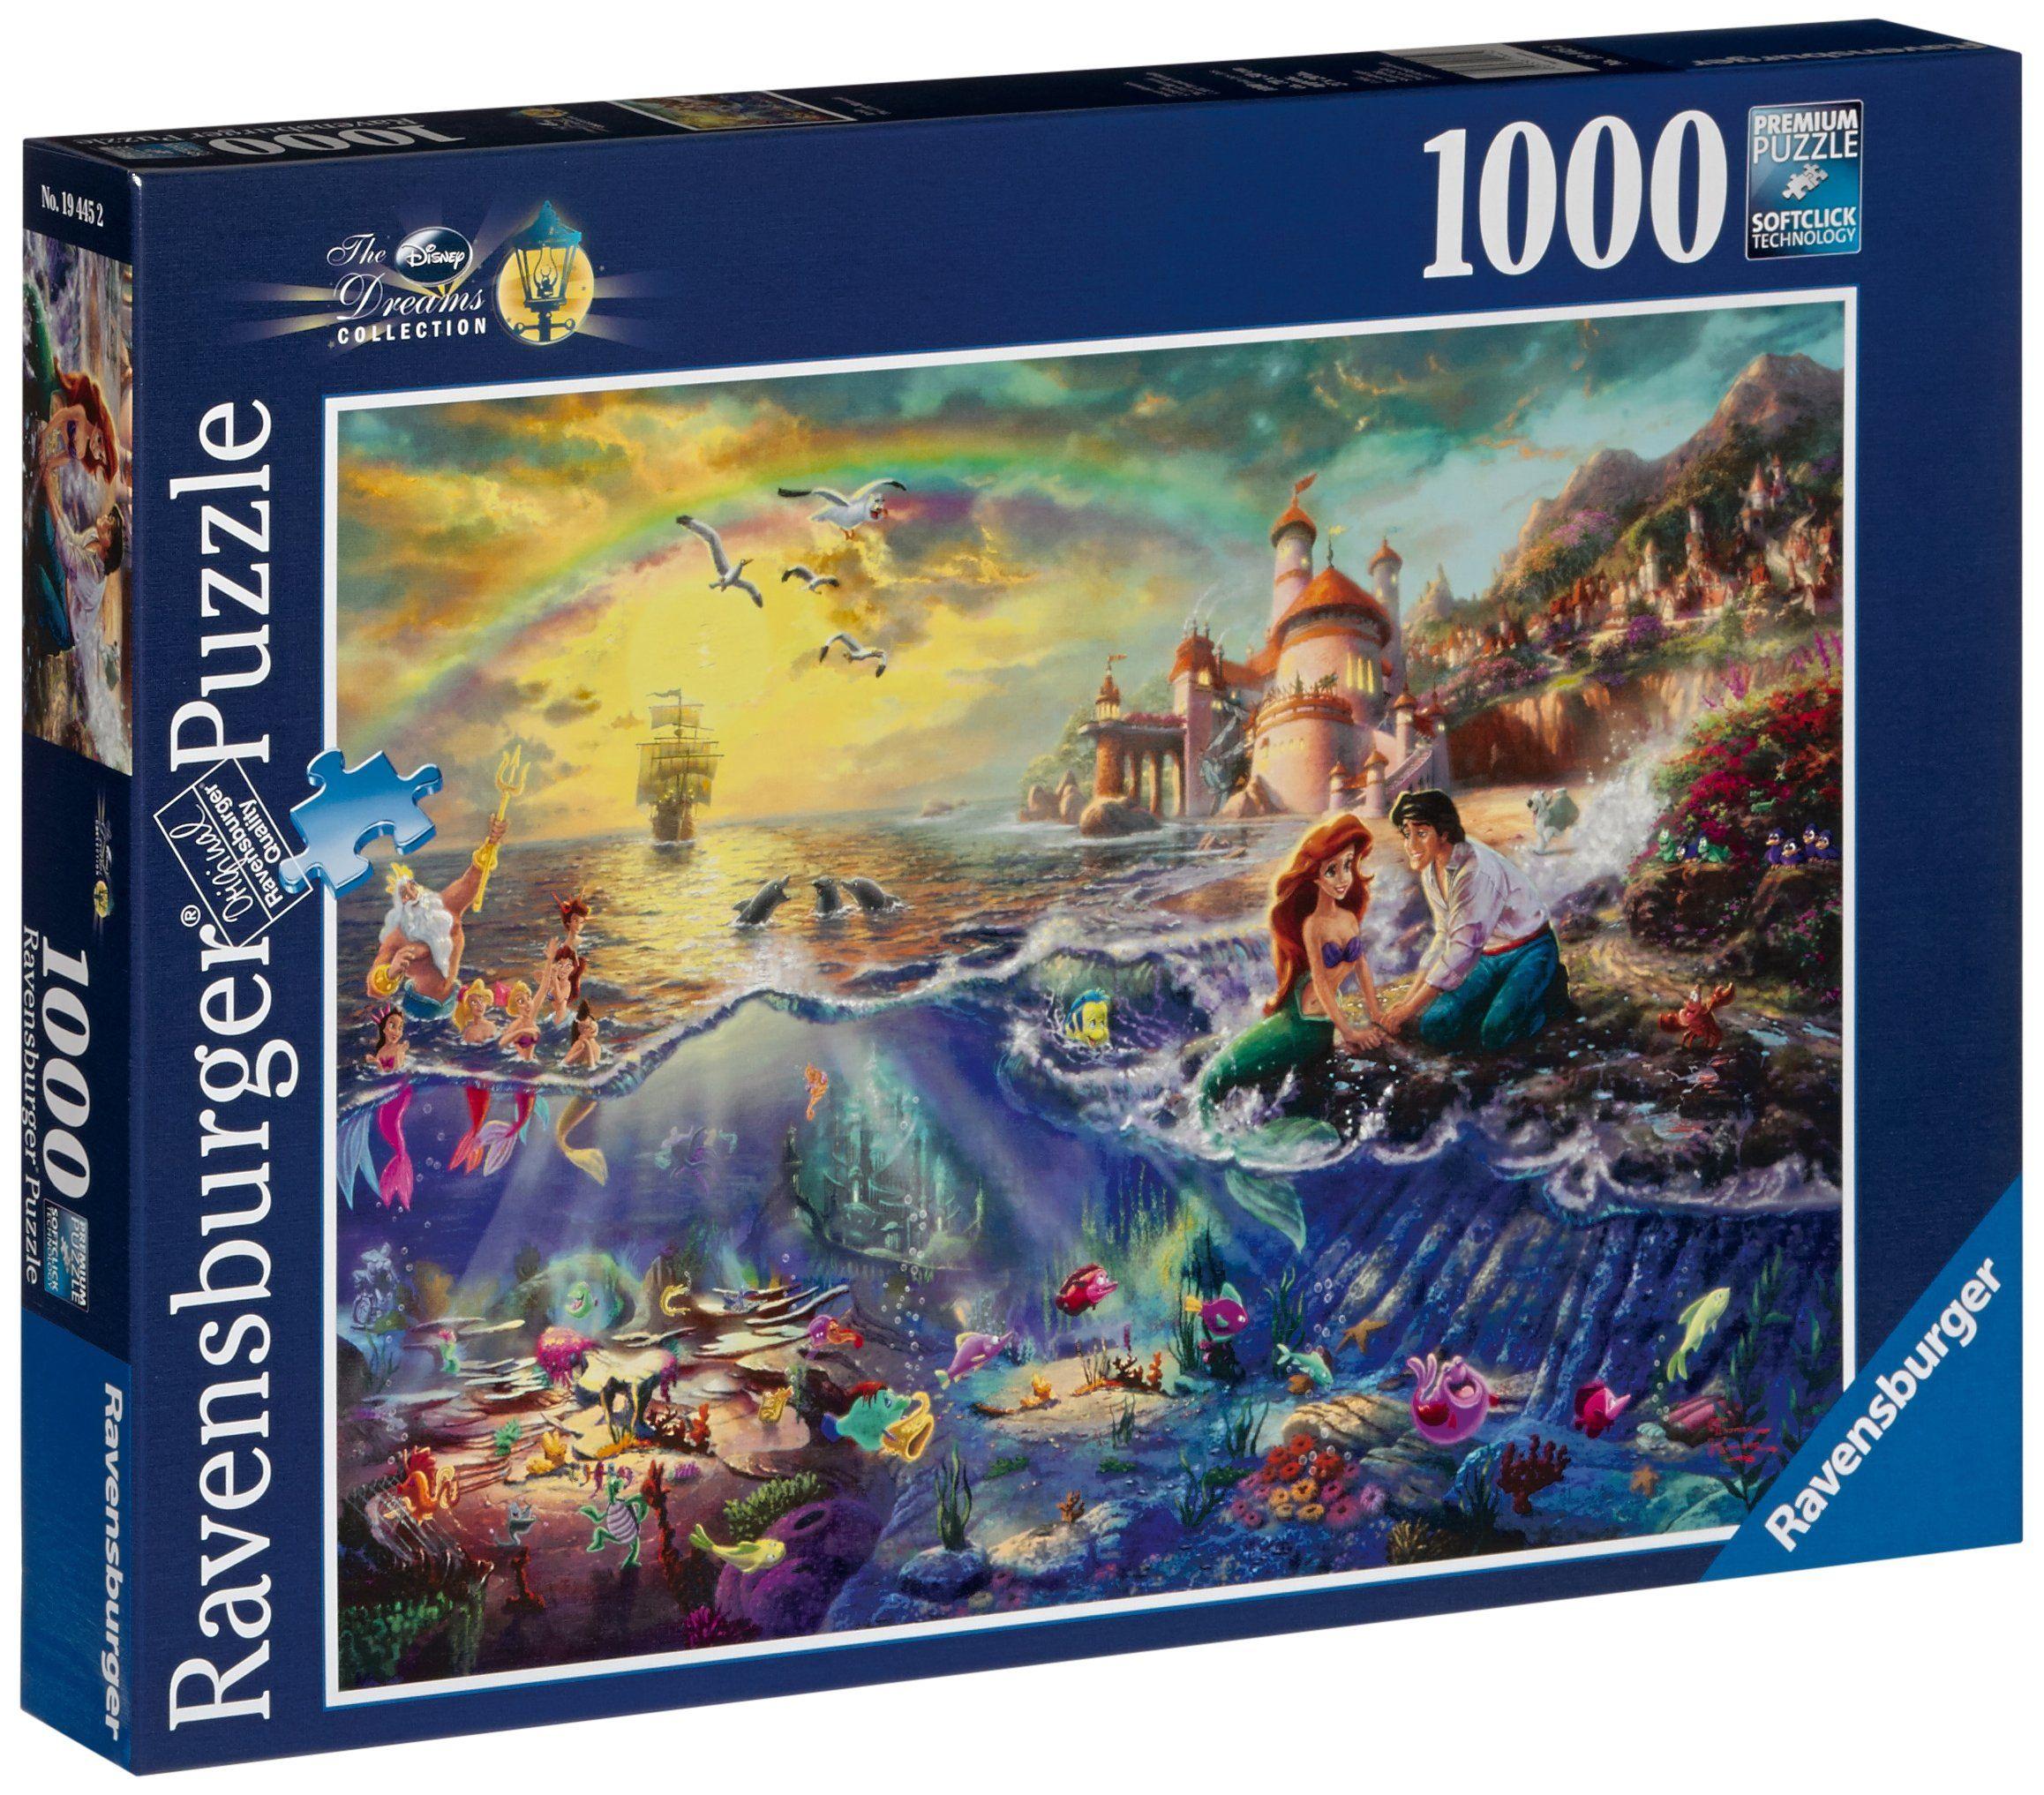 Ravensburger Puzzle Thomas Kinkade Disney Ariel 1000 Pieces Thomas Kinkade Disney Disney Puzzles Disney Jigsaw Puzzles